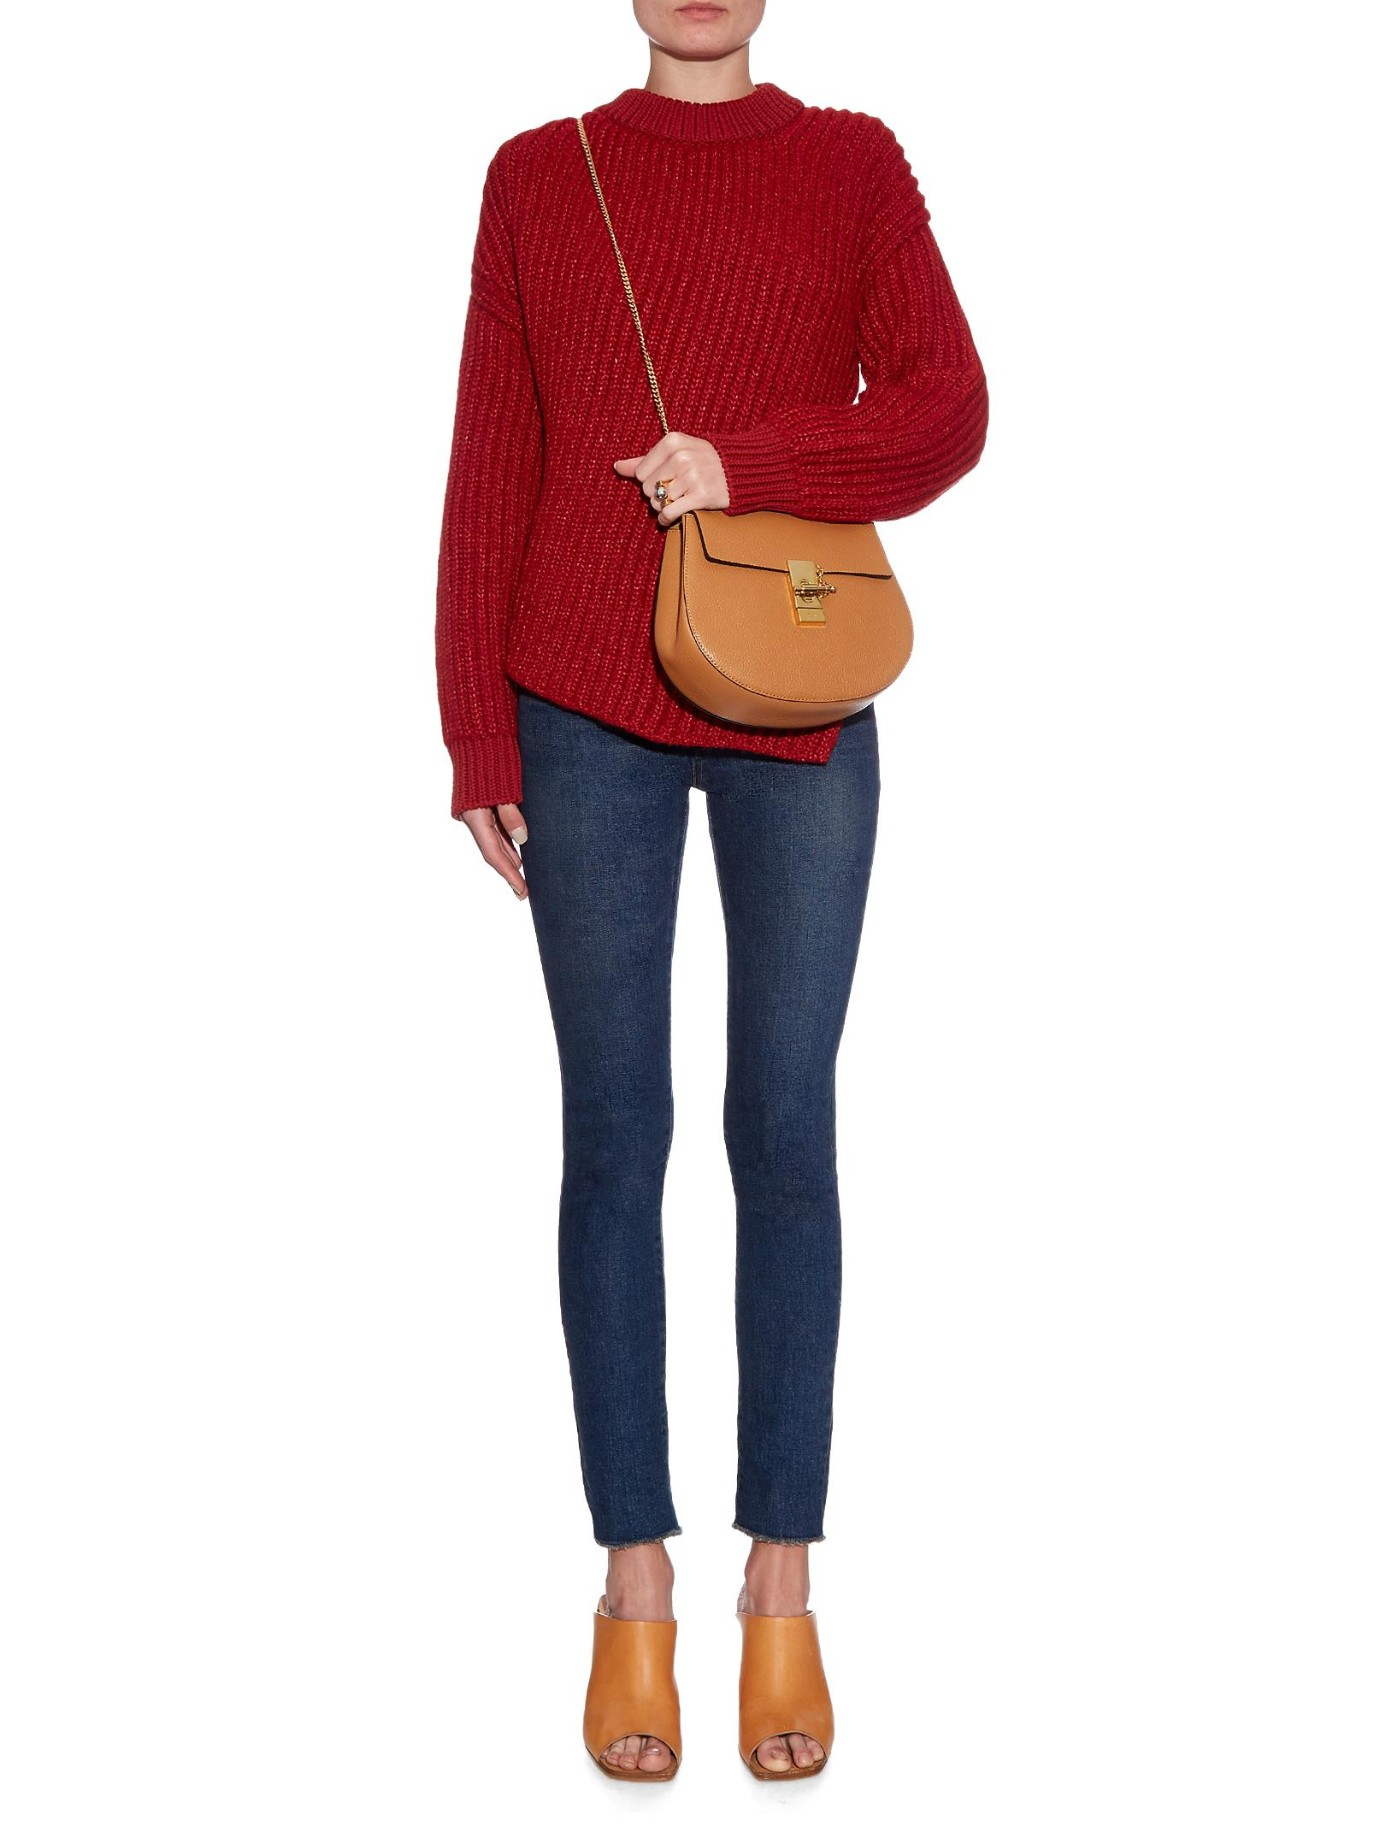 fake chloe bags - Chlo�� Drew Small Leather Shoulder Bag in Brown (TAN) | Lyst